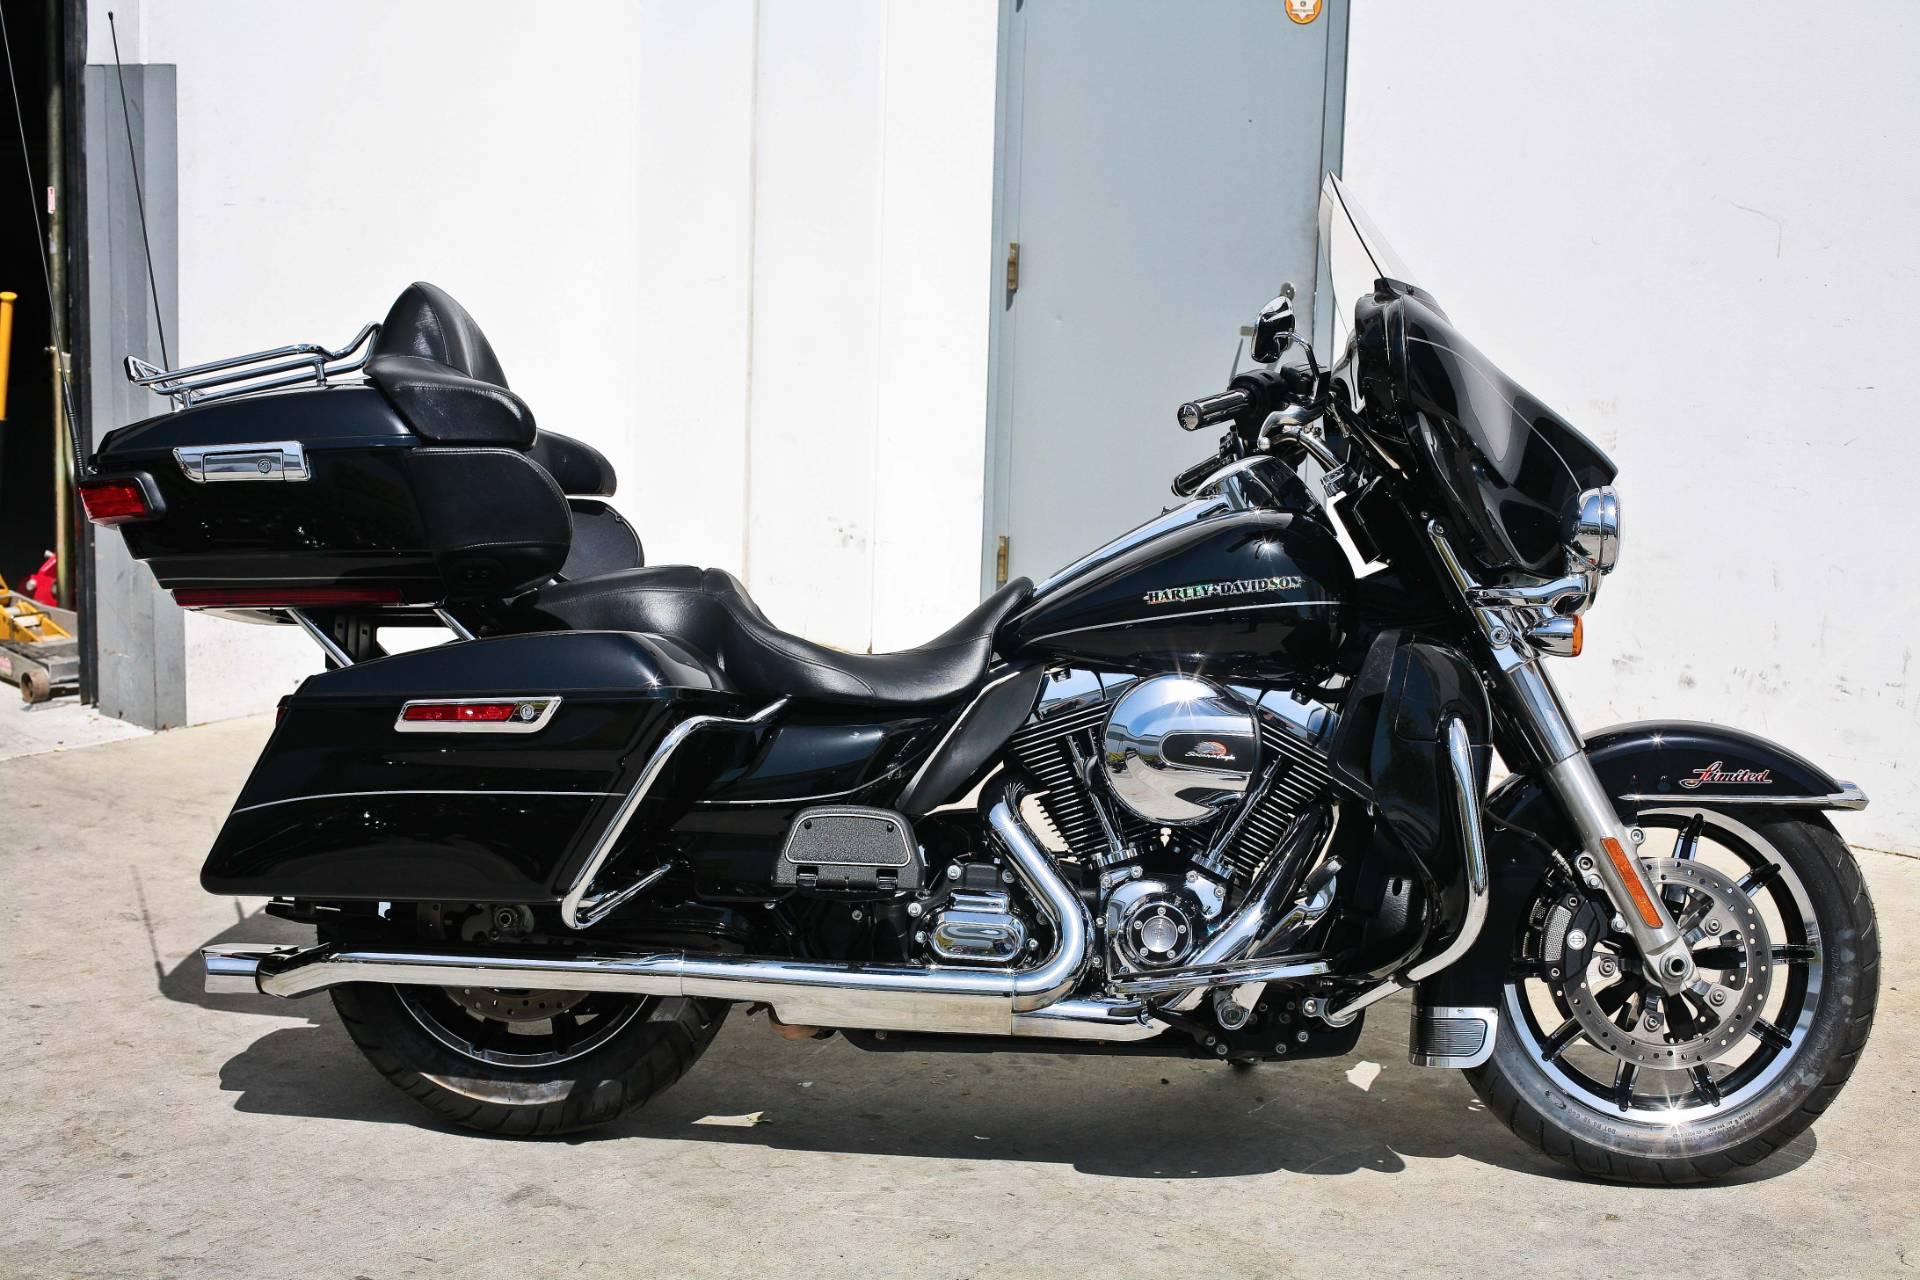 used 2015 harley davidson ultra limited motorcycles in moorpark ca. Black Bedroom Furniture Sets. Home Design Ideas